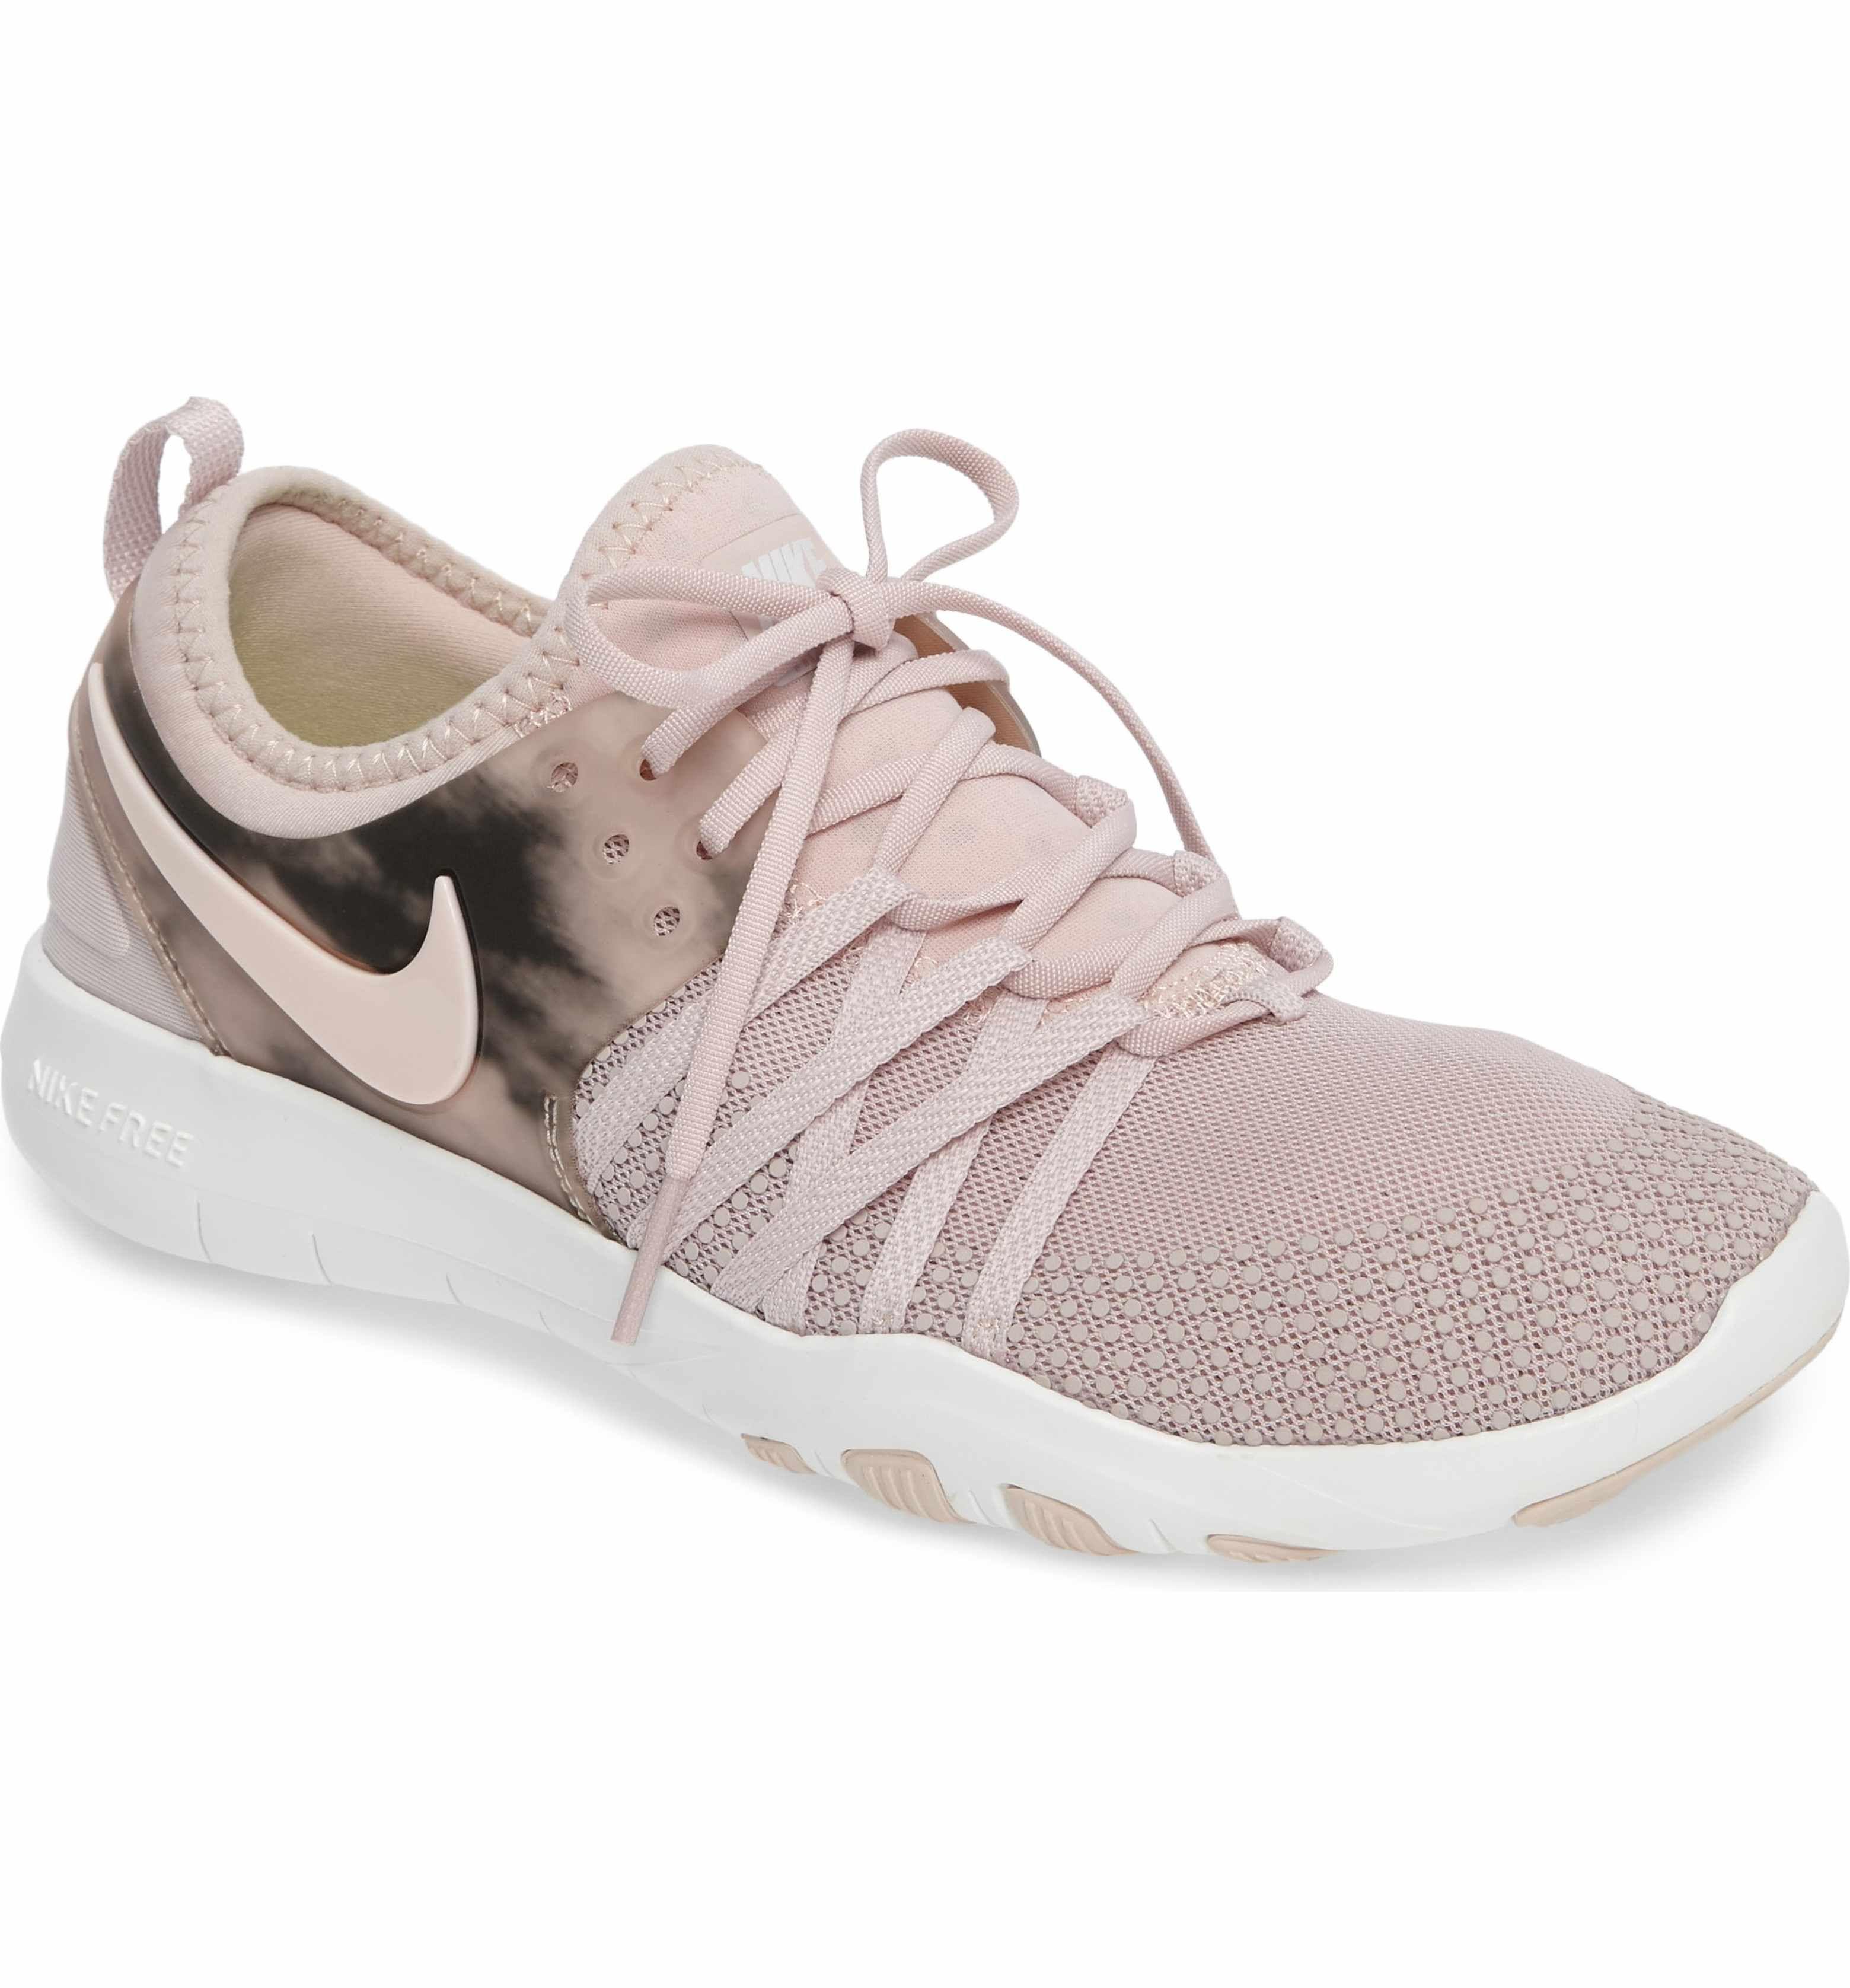 1d3a2a7292db Free TR7 Amp Training Shoe